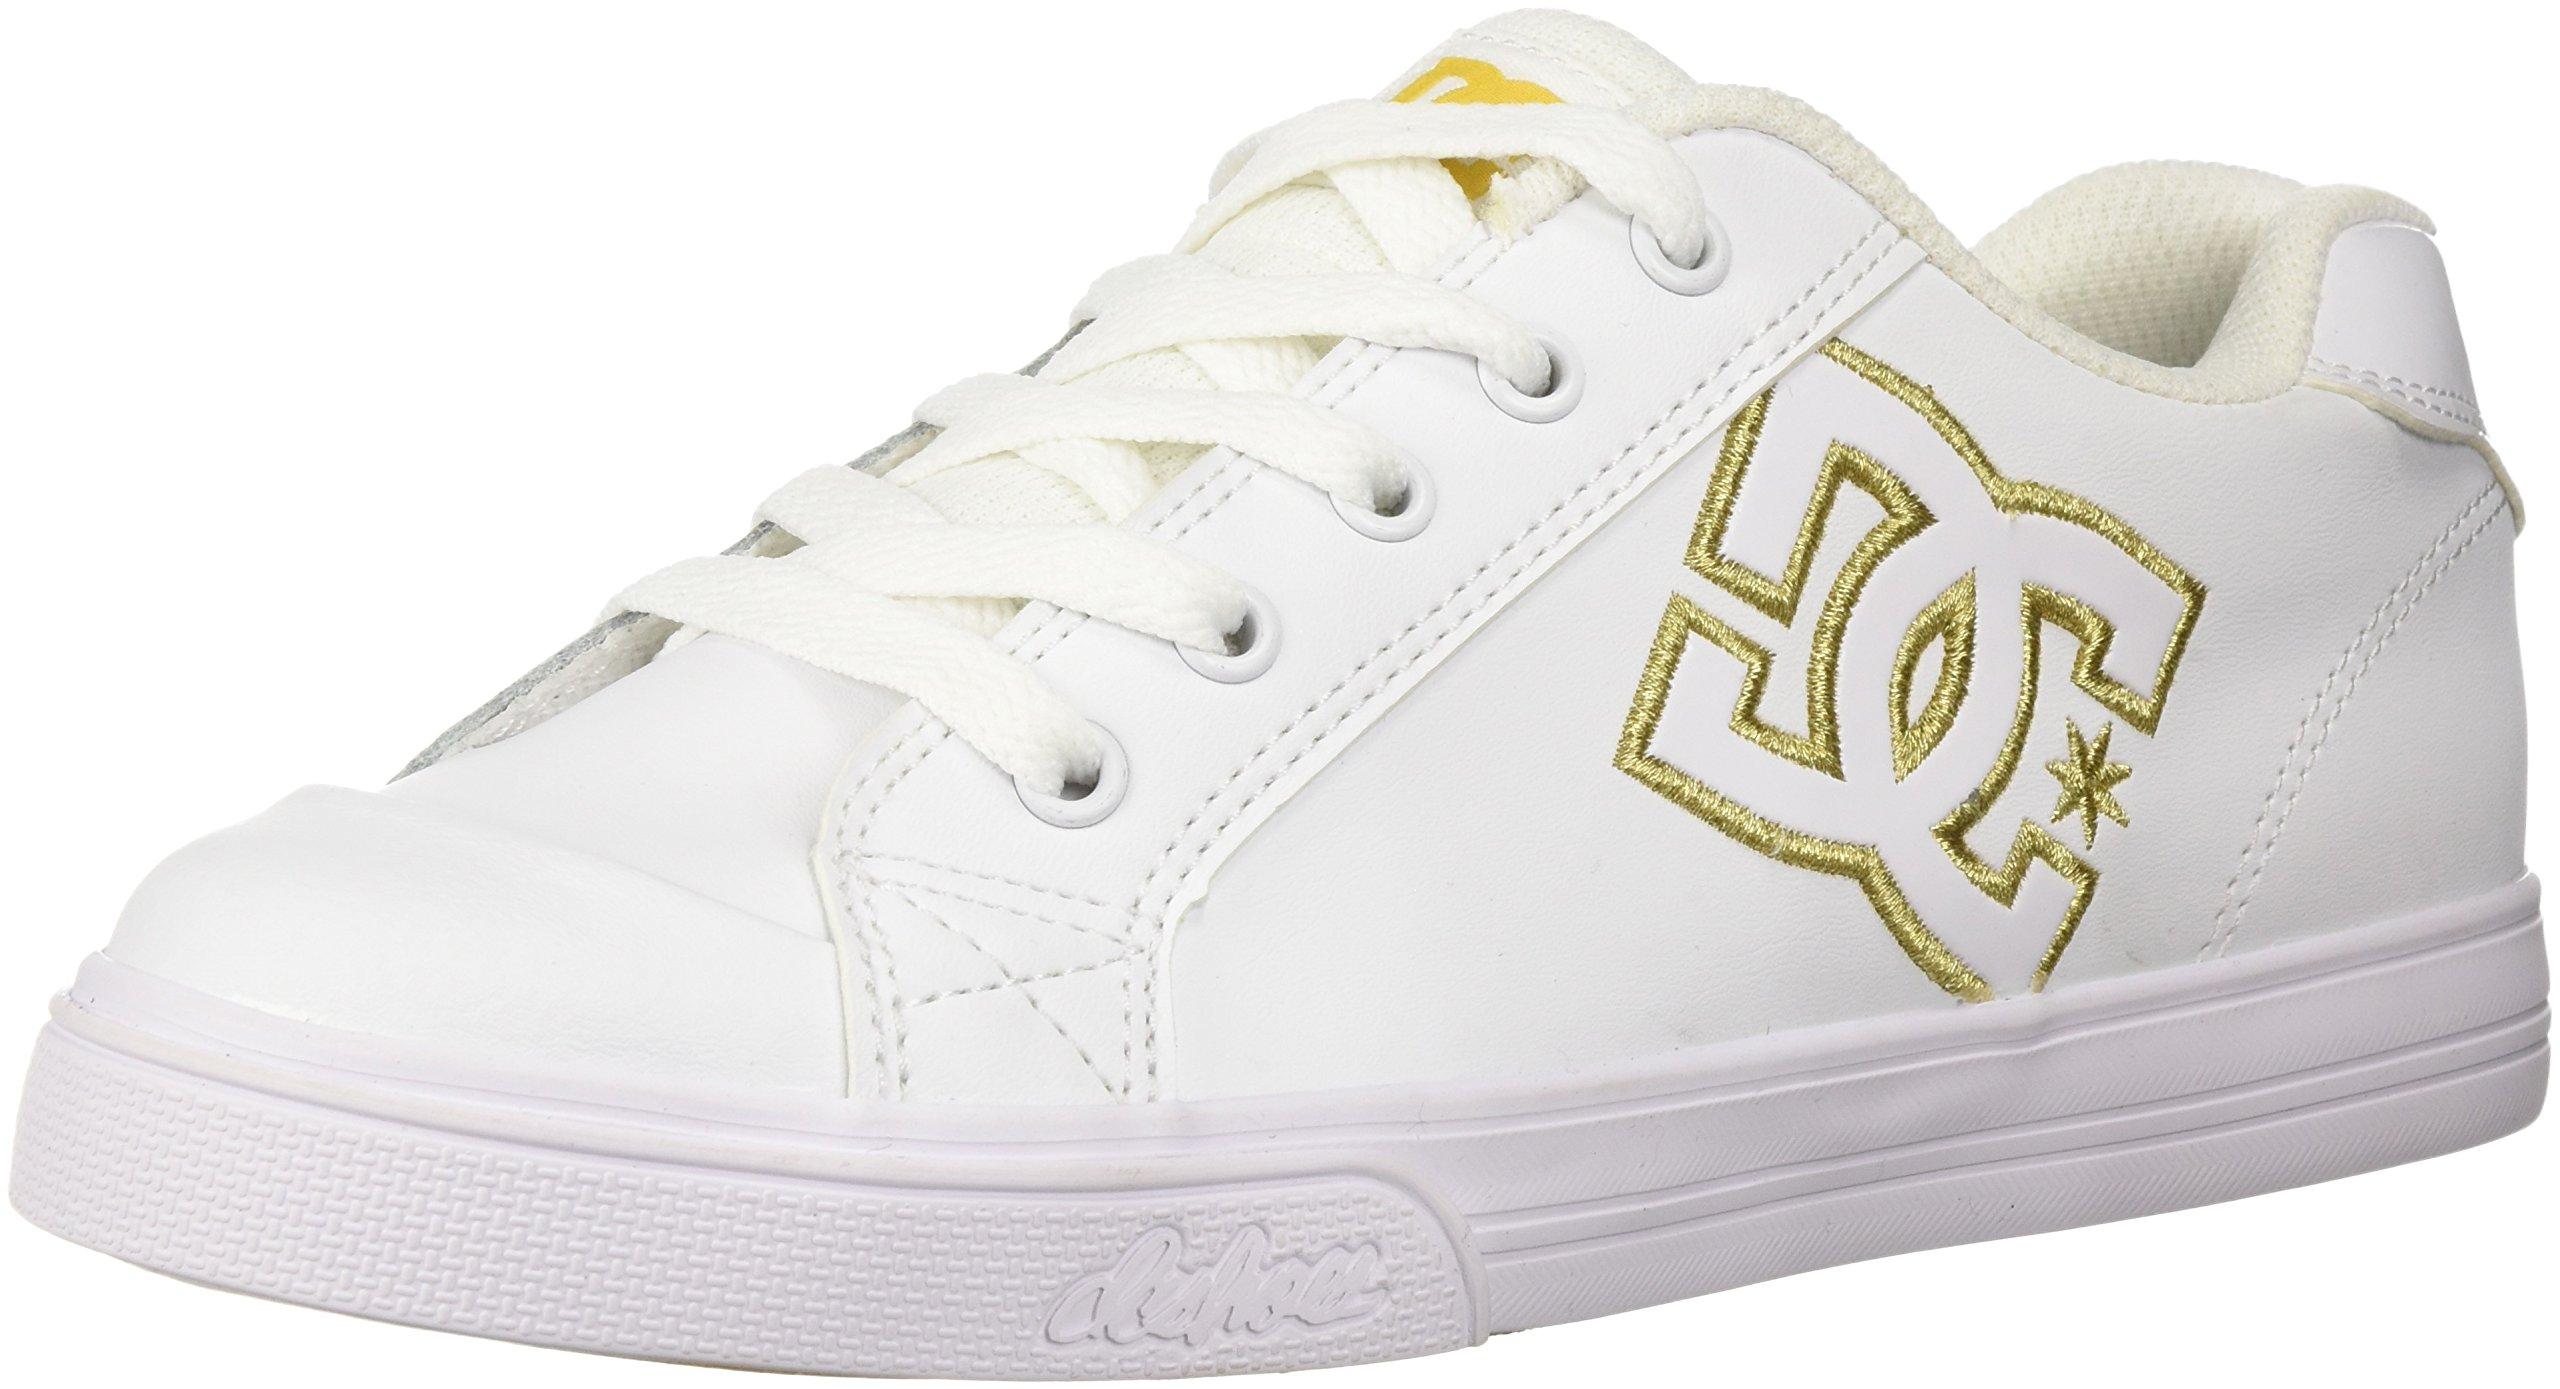 DC Girls Youth Chelsea SE Skate Shoes, White/Gold, 1 M US Little Kid